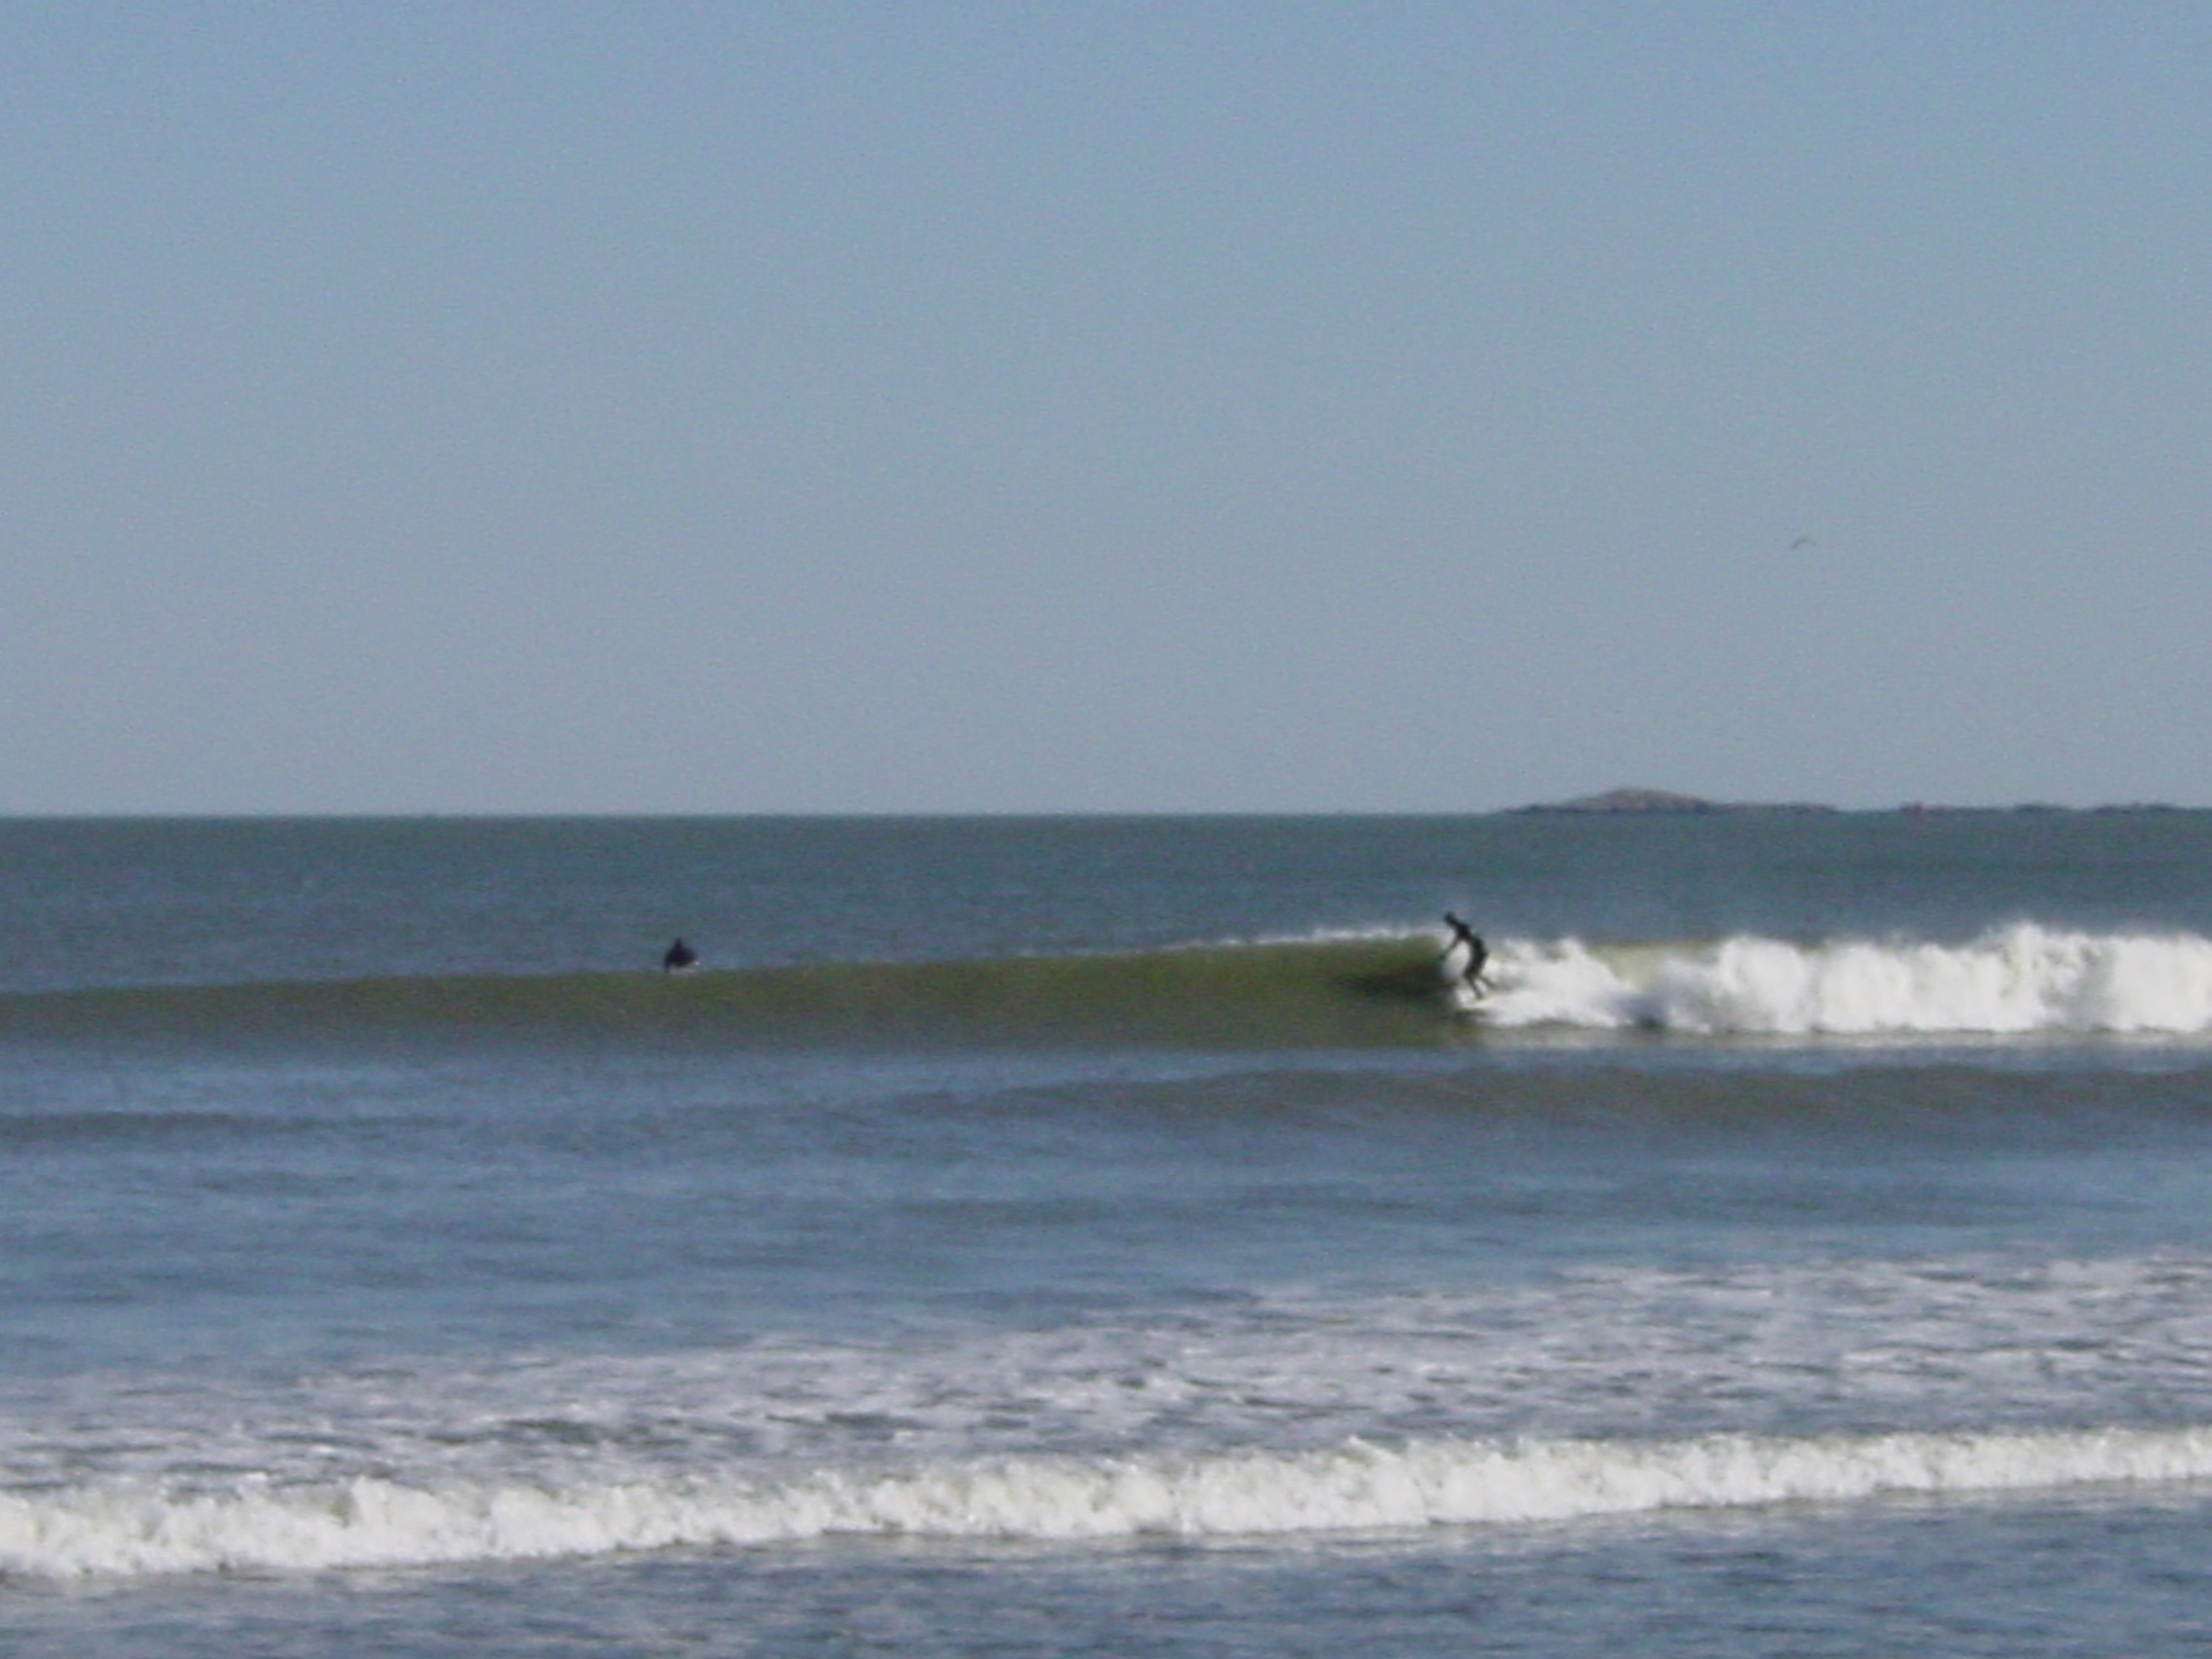 Surfing the Dump 11-07 002.jpg